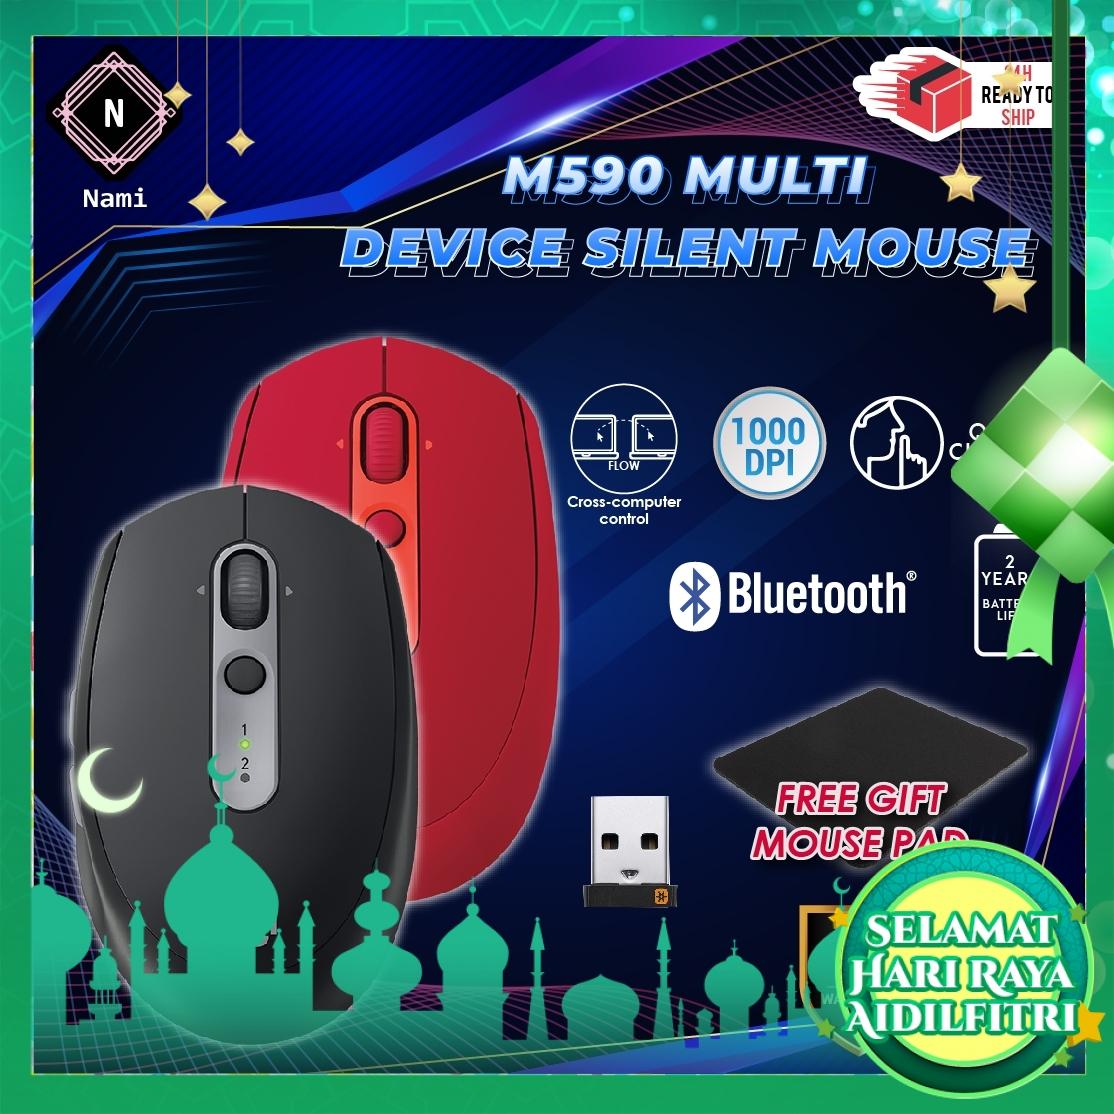 Logitech Mouse M590 Multi-Device Silent